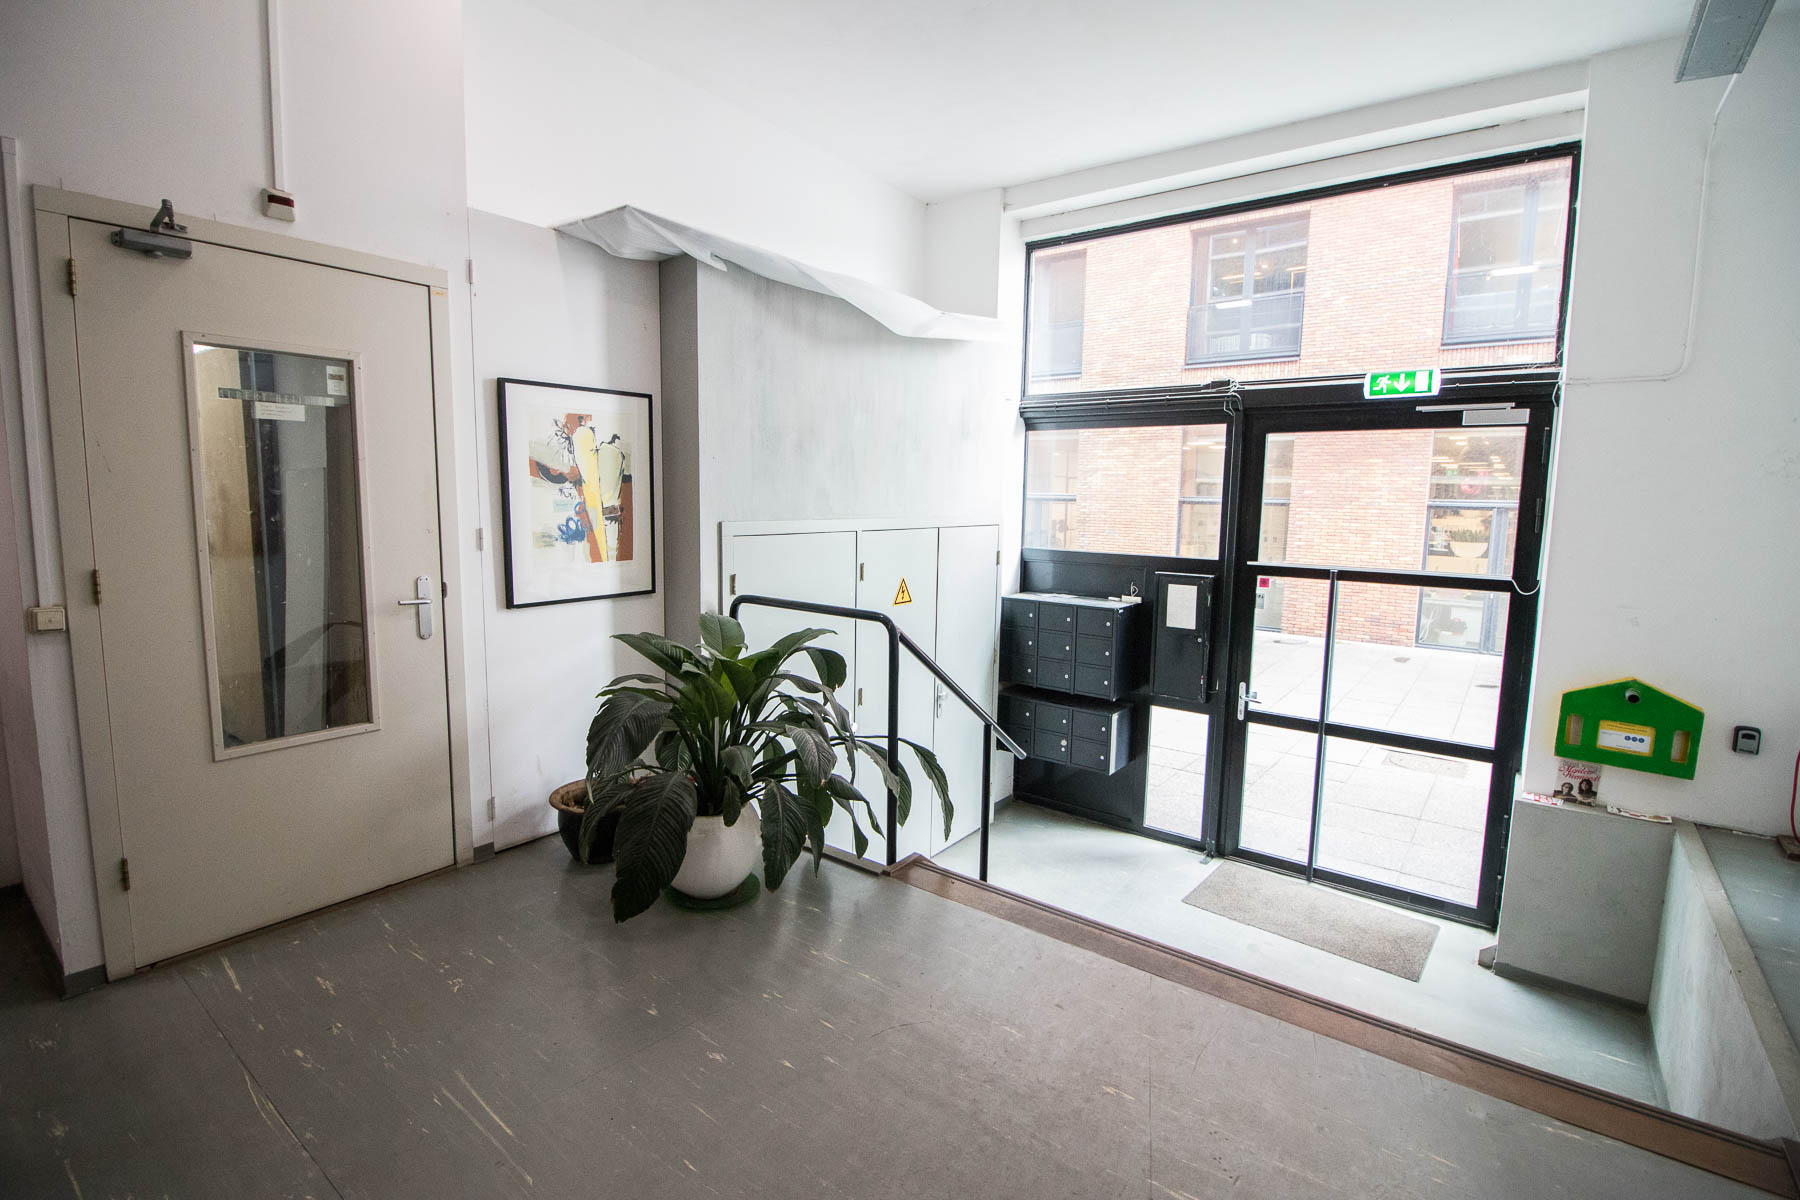 Rent office space Groenhoedenveem 28, Amsterdam (6)